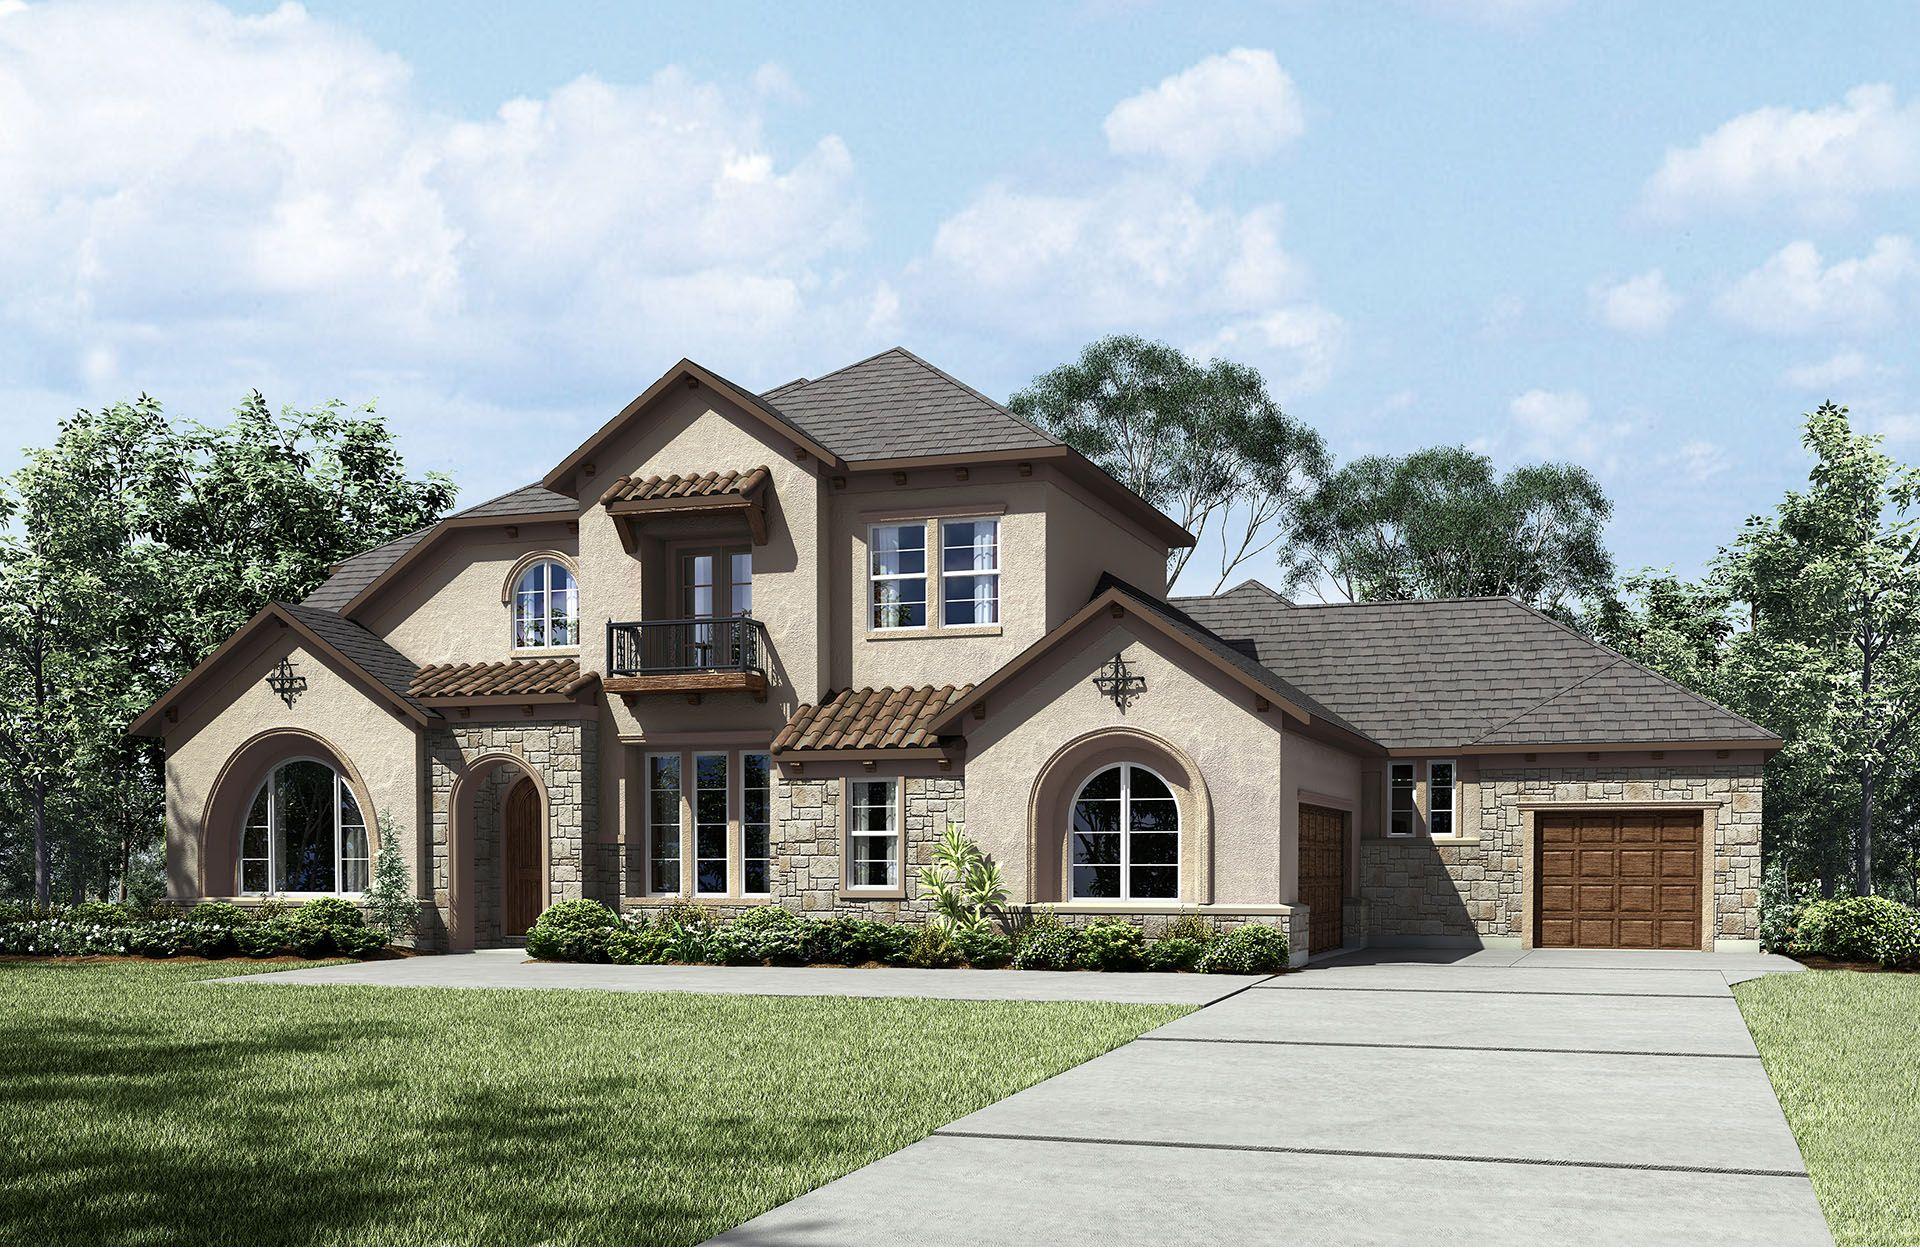 Drees Custom Homes Floor Plans: Travisso In Leander, TX, New Homes & Floor Plans By Drees